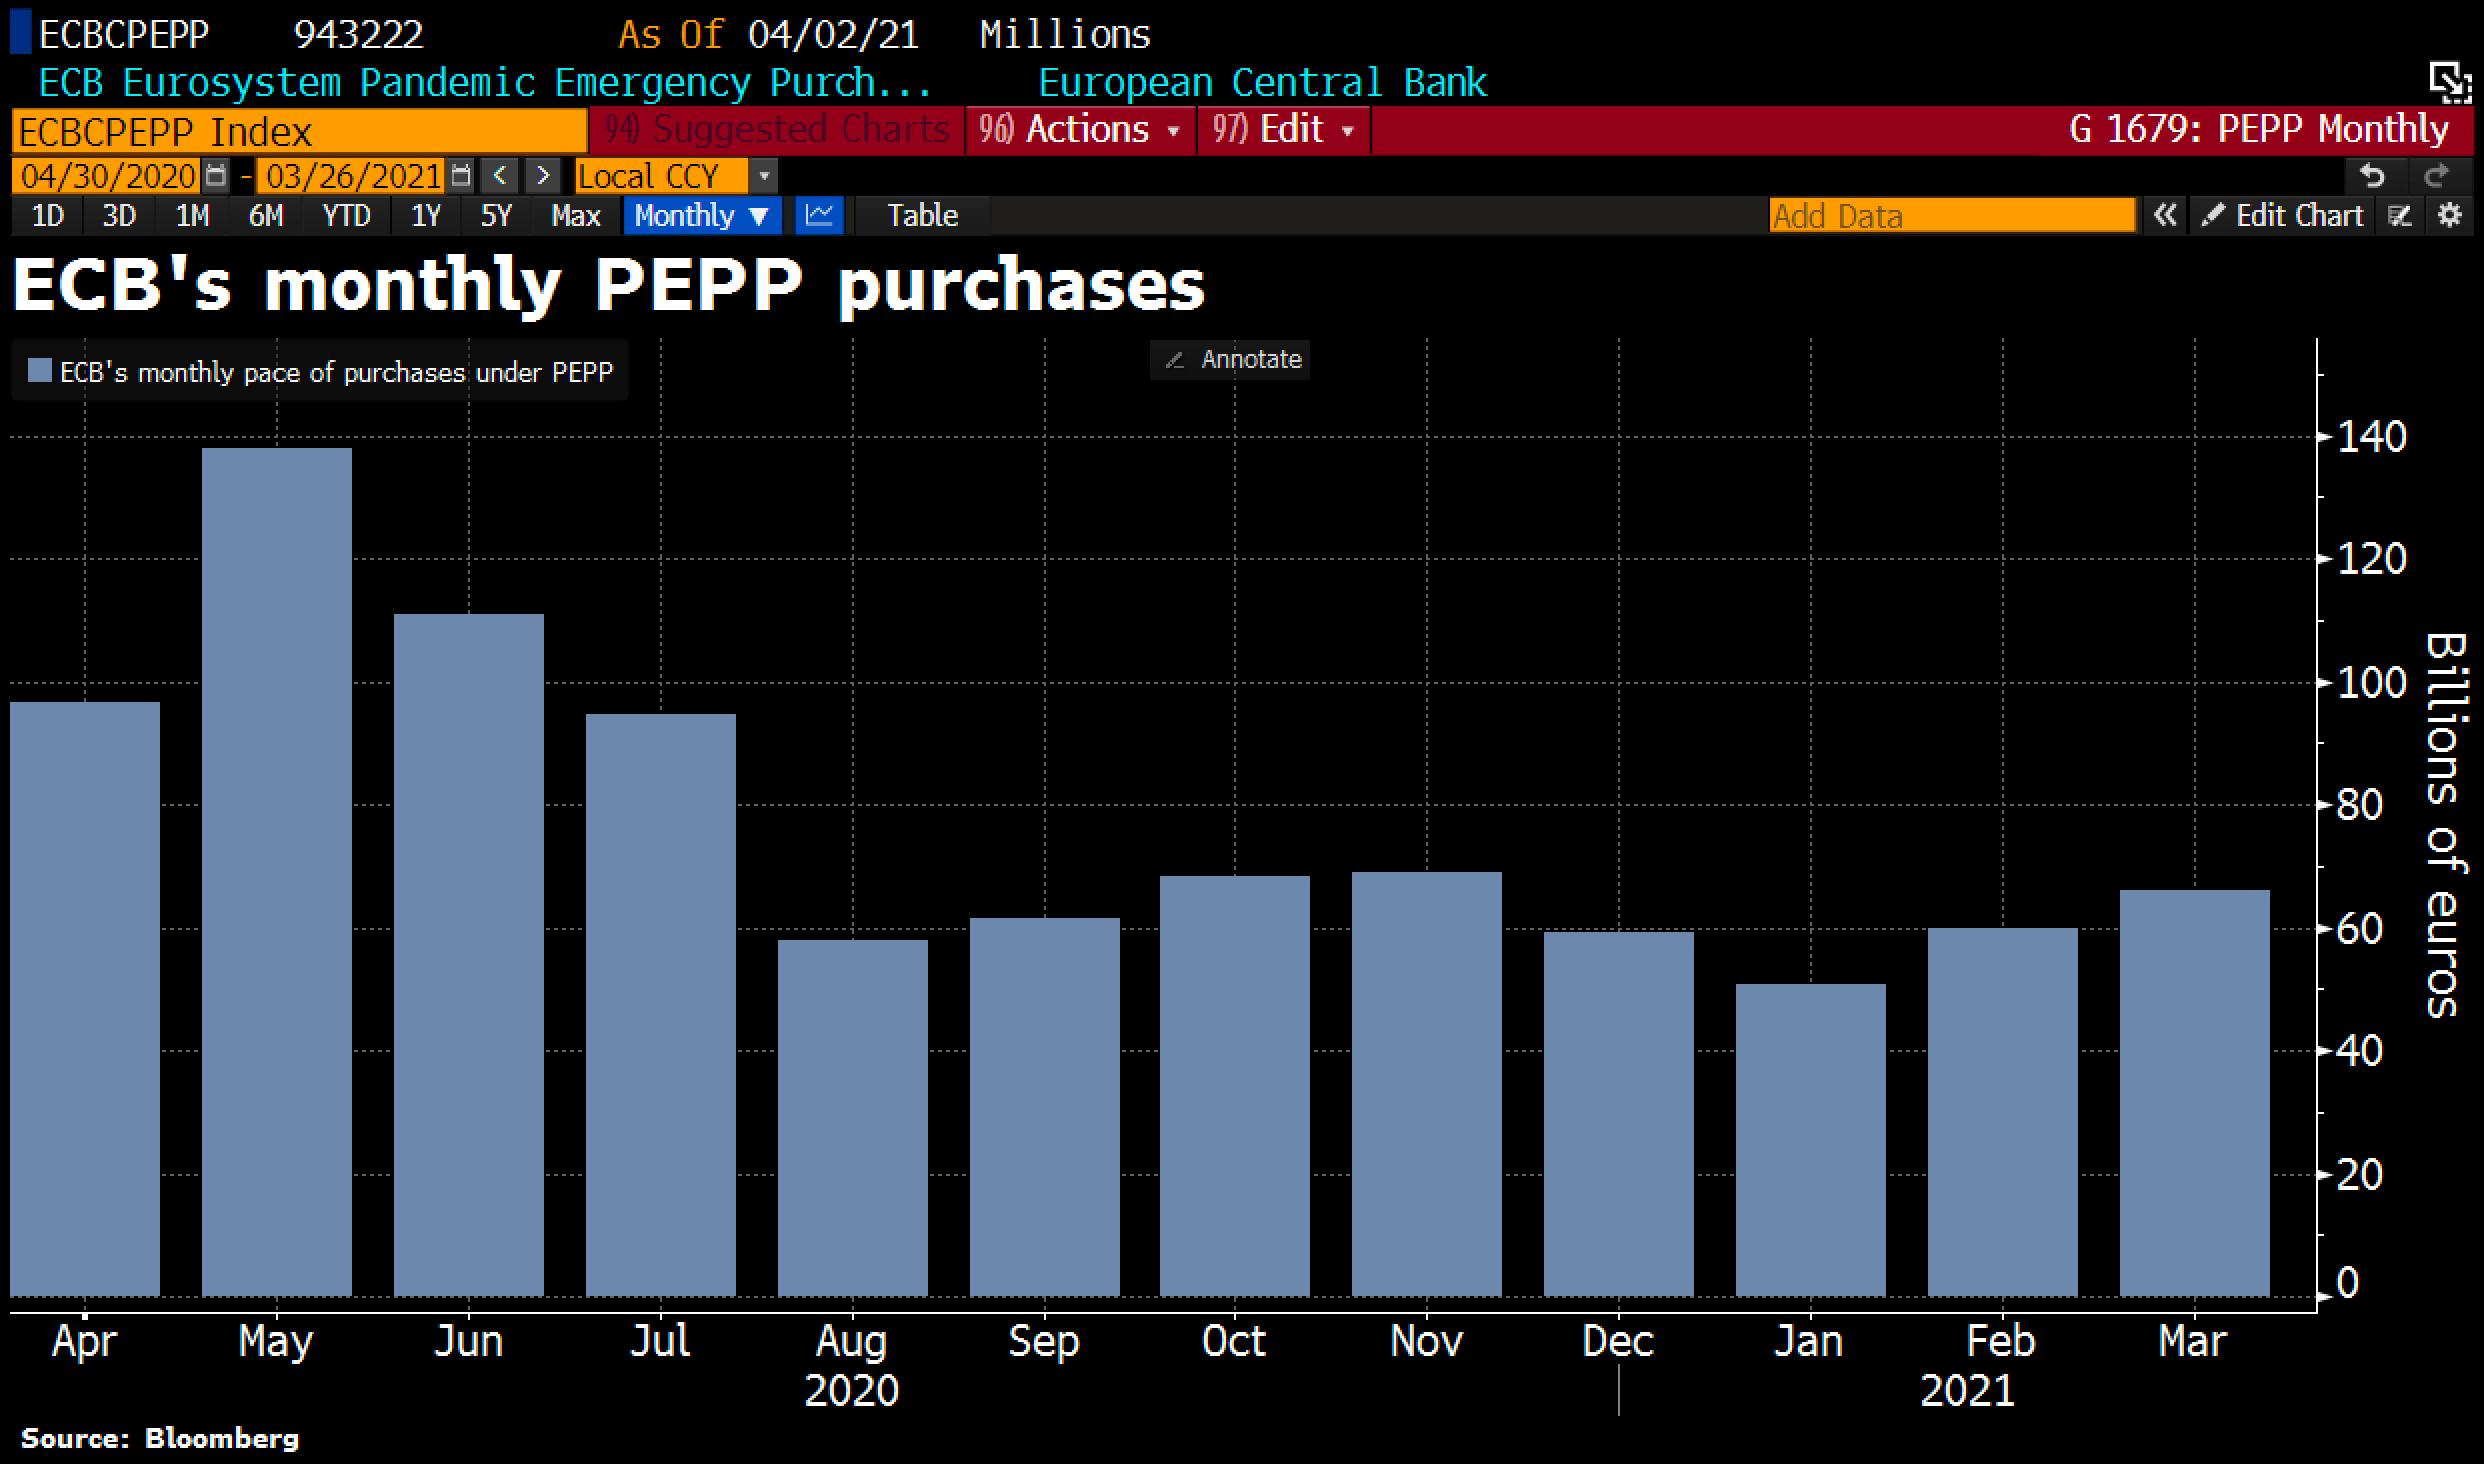 ECB monthly PEPP purchases. © Holger Zschaepitz via Twitter @Schuldensuehner, April 8th, 2021.